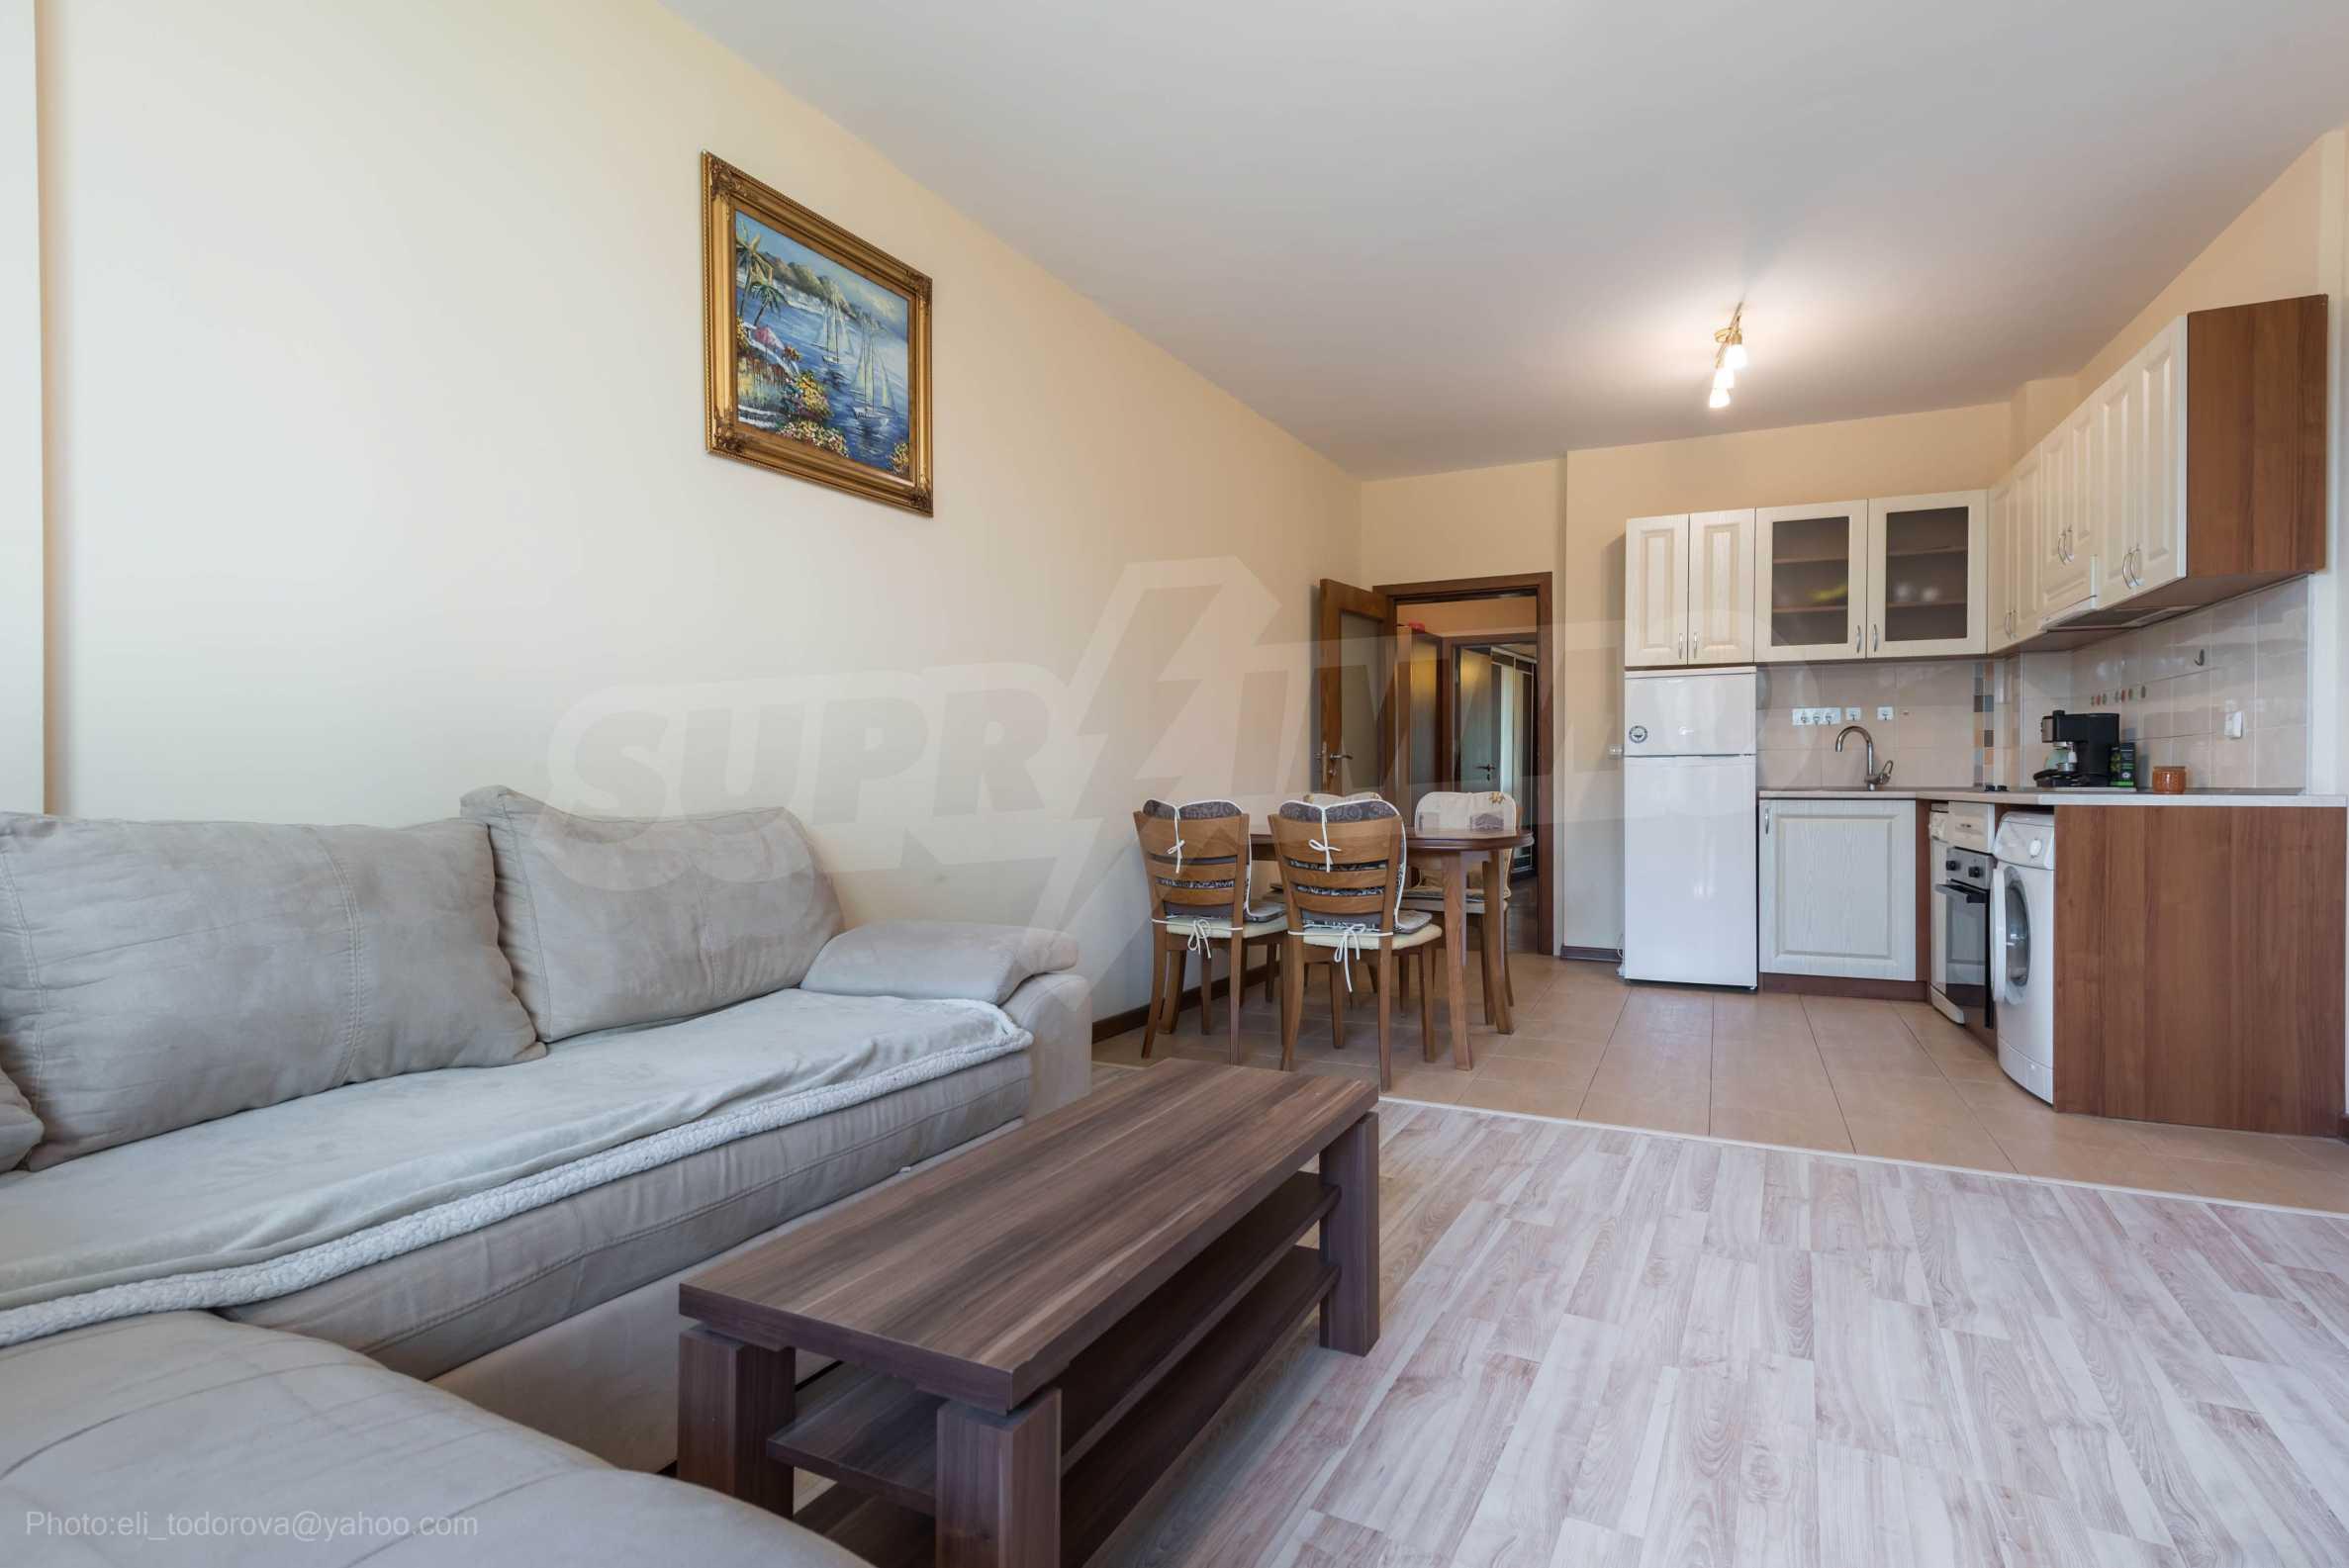 Квартира в аренду в Варне 5